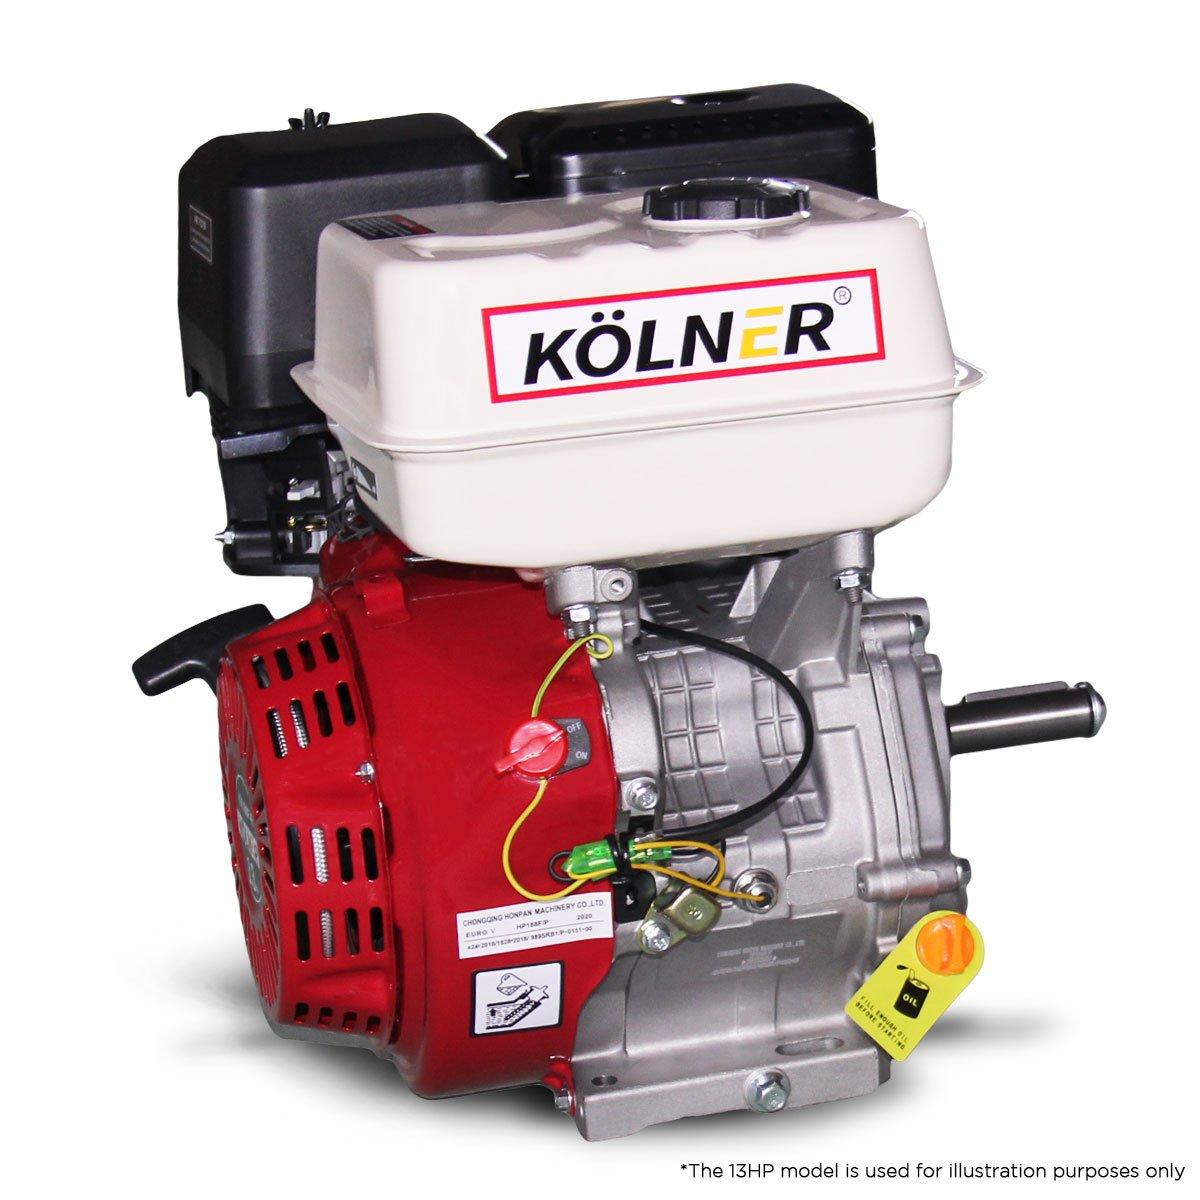 Kolner 16hp 25.4mm Horizontal Key Shaft Q Type Petrol Engine - Recoil Start